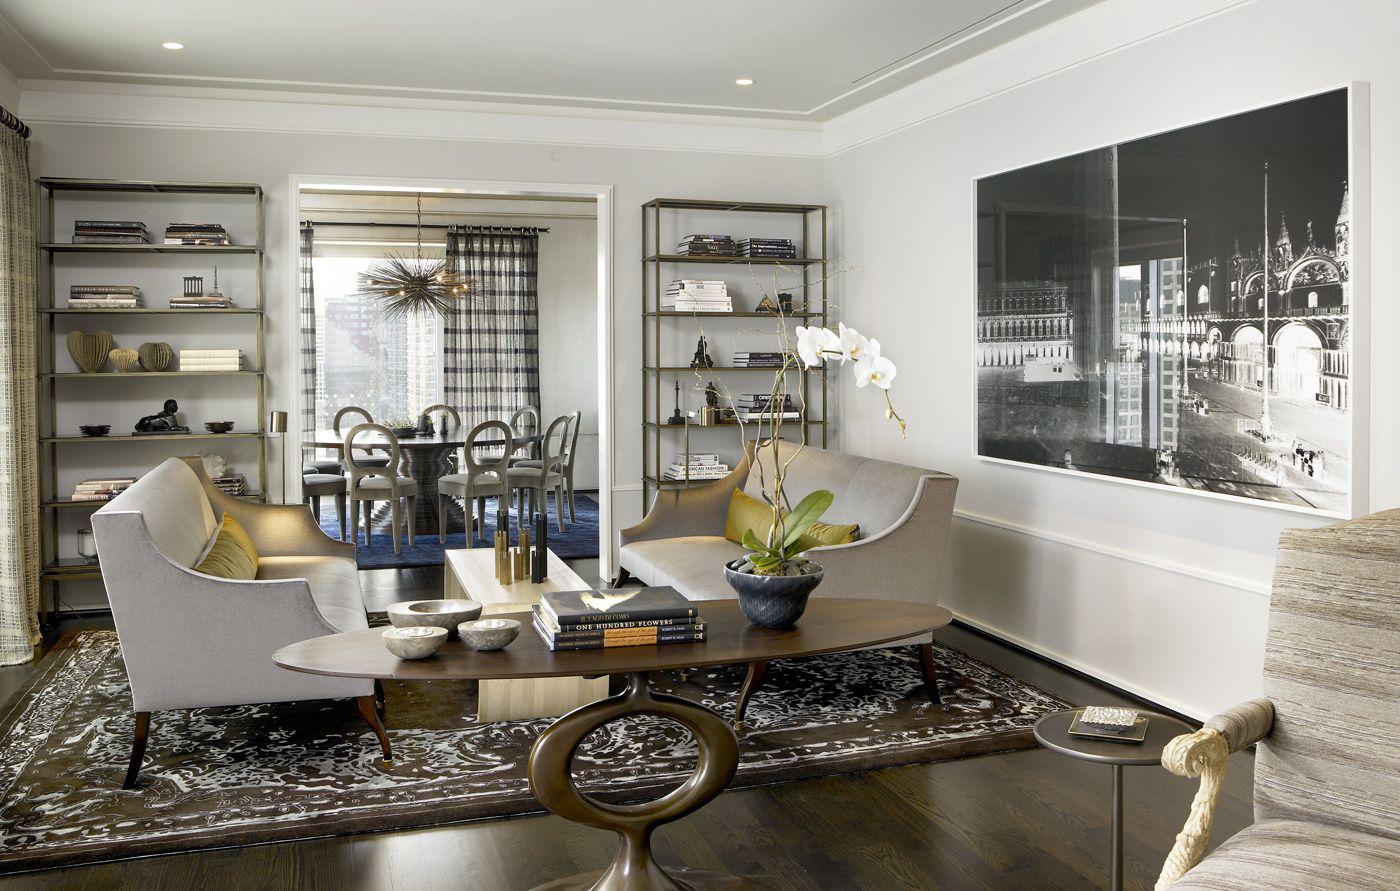 kara mann design | interiors | pinterest | apartments, living